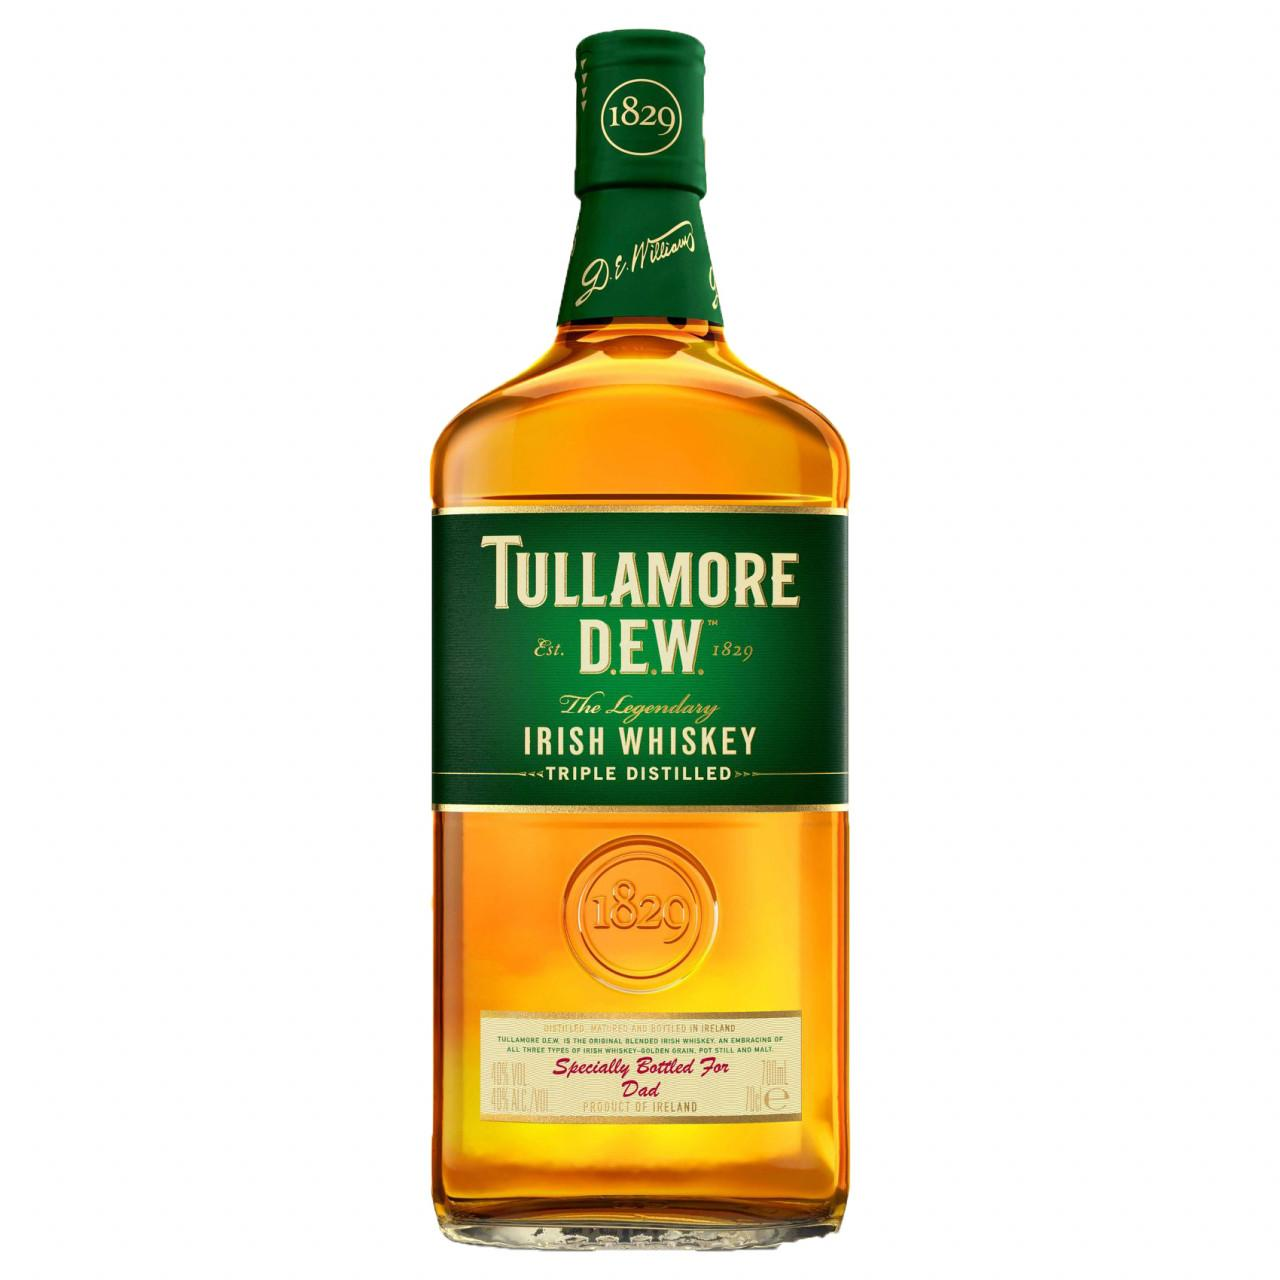 Tullamore Dew Irish Whisky 40% 0,7l